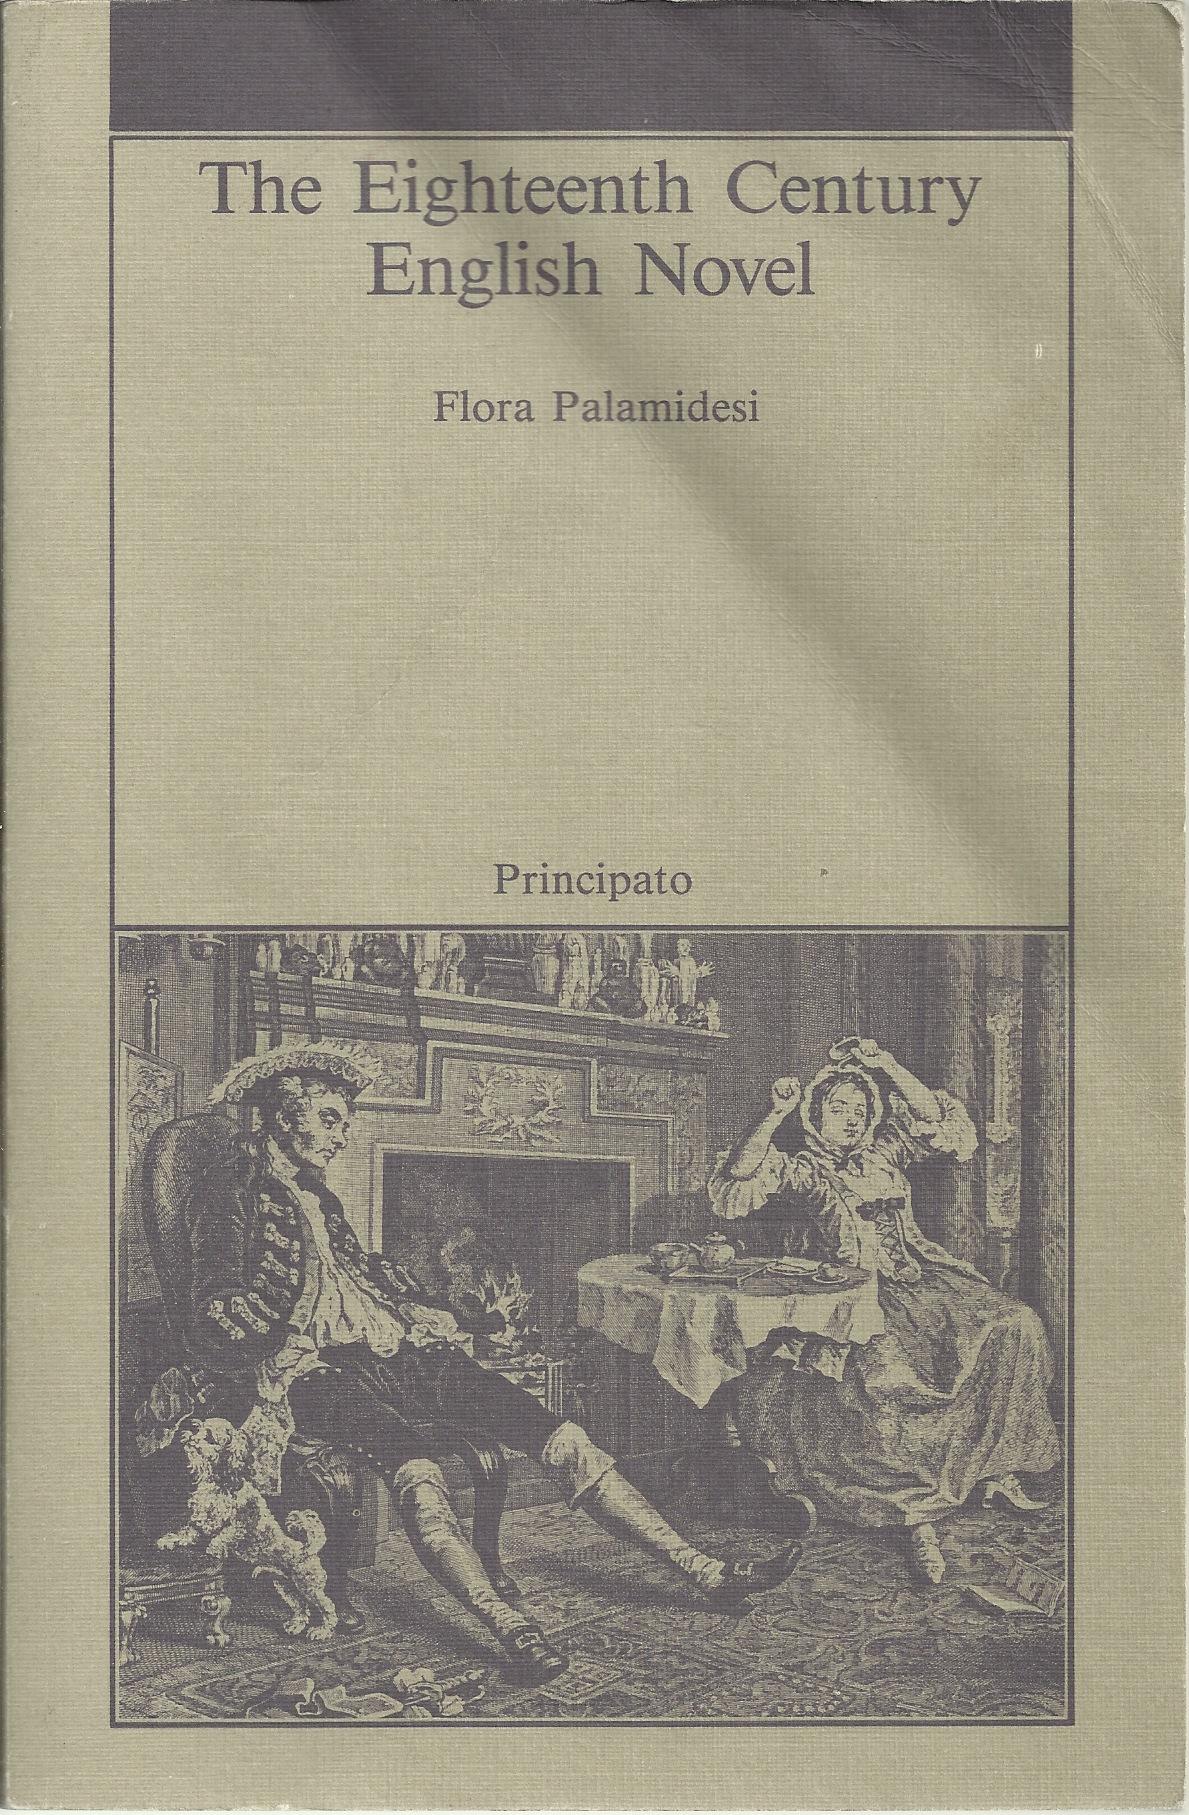 The eighteenth century English novel